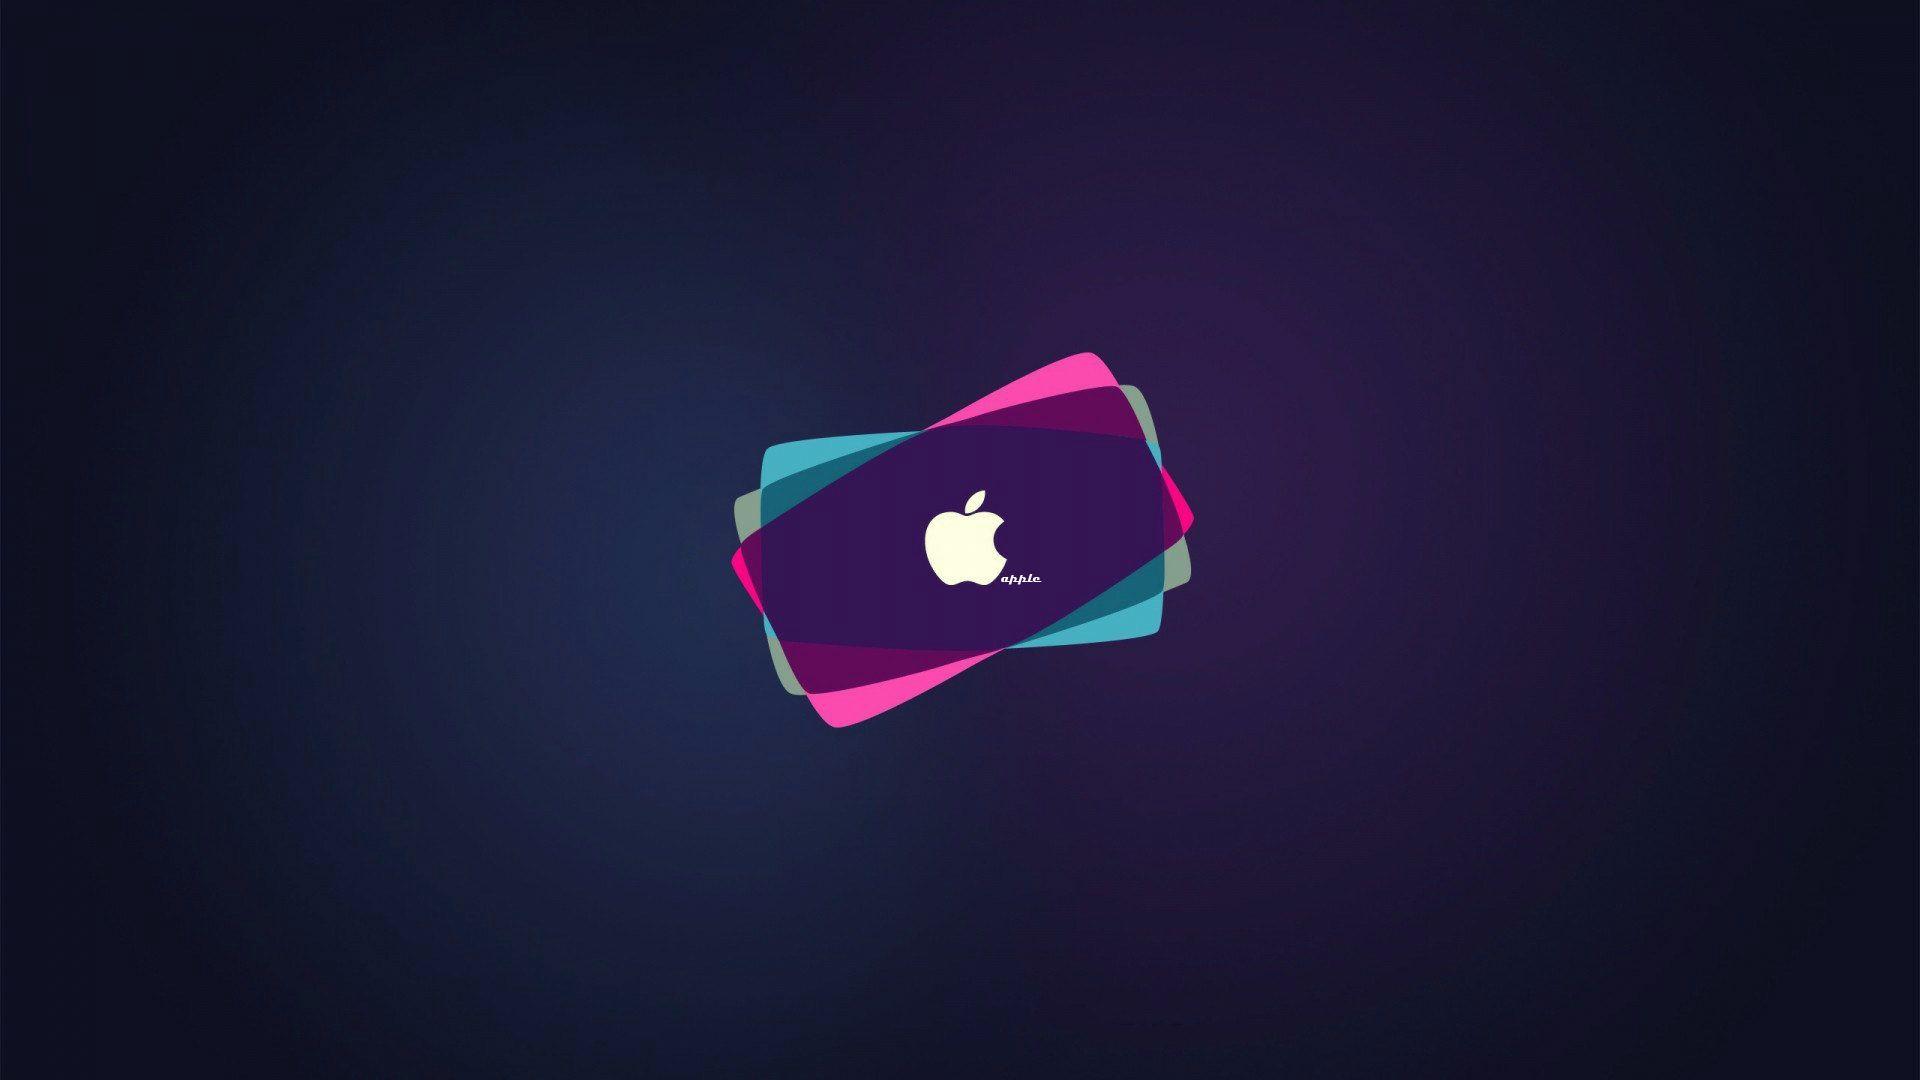 Mac wallpaper 1080p lugares para visitar pinterest mac mac wallpaper 1080p voltagebd Gallery